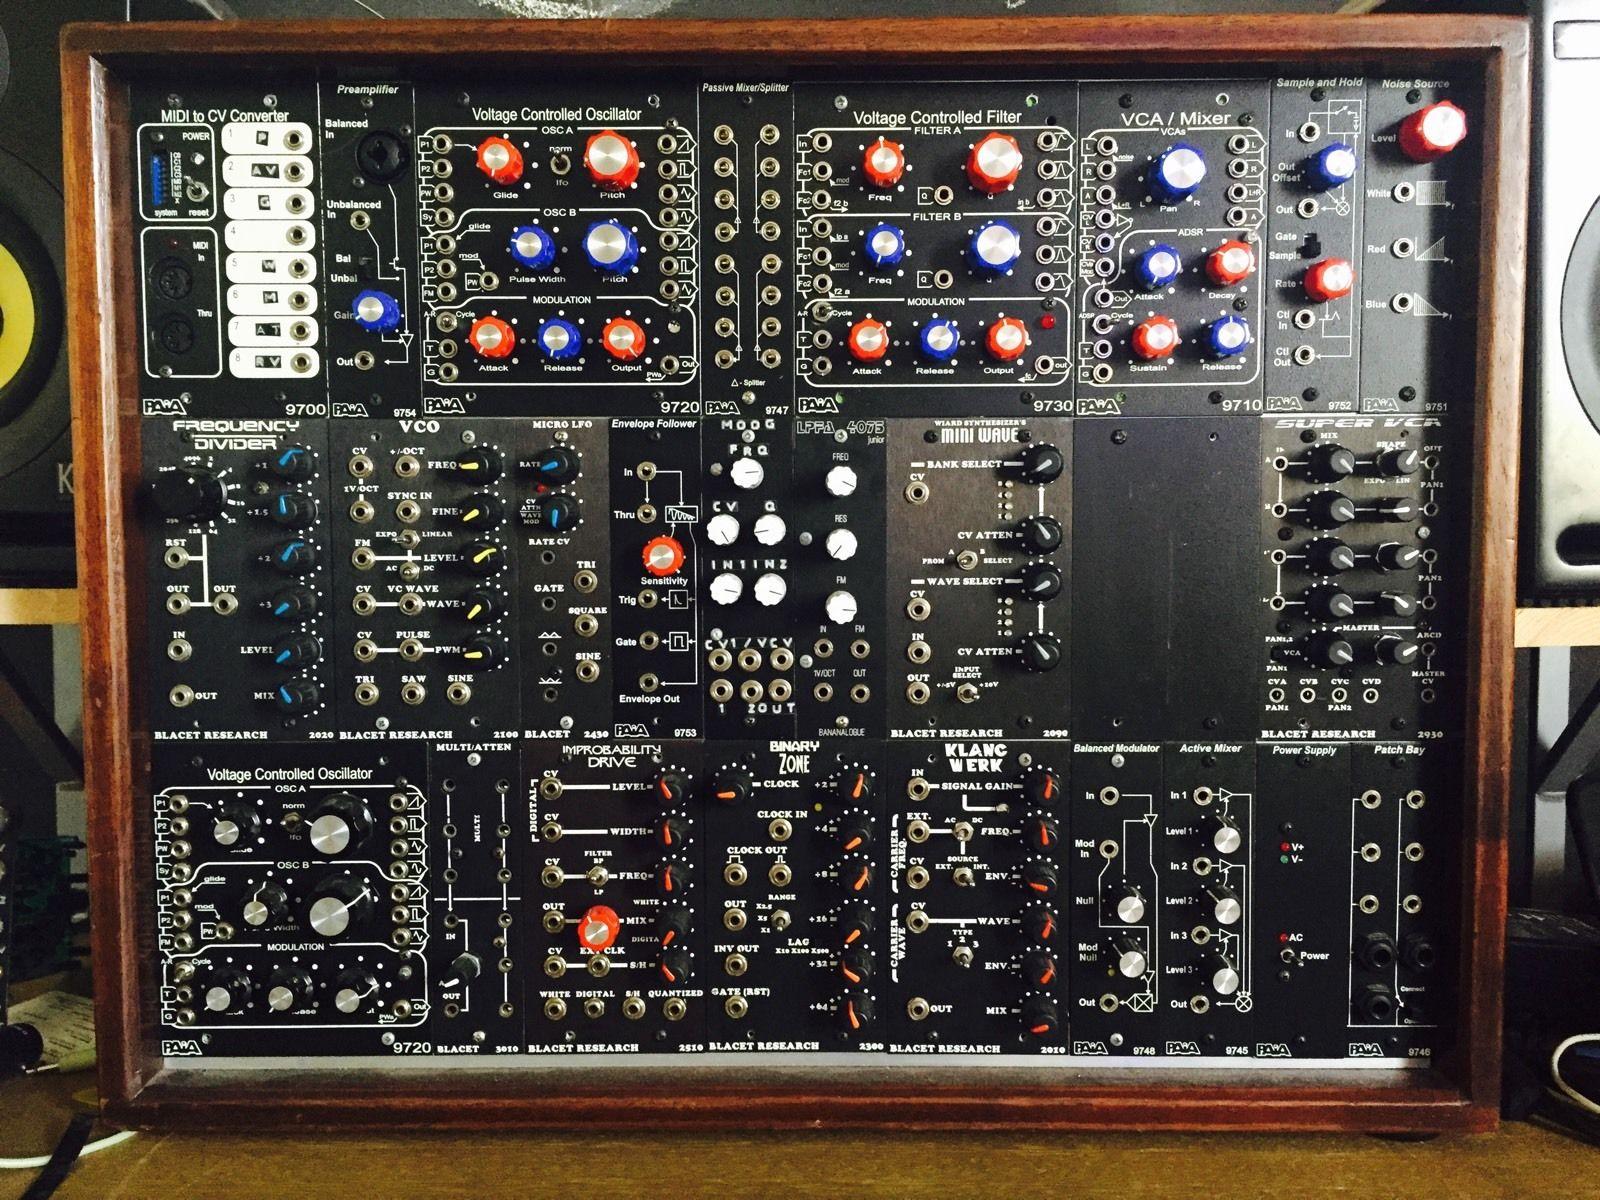 matrixsynth frac rack modular synthesizer system. Black Bedroom Furniture Sets. Home Design Ideas